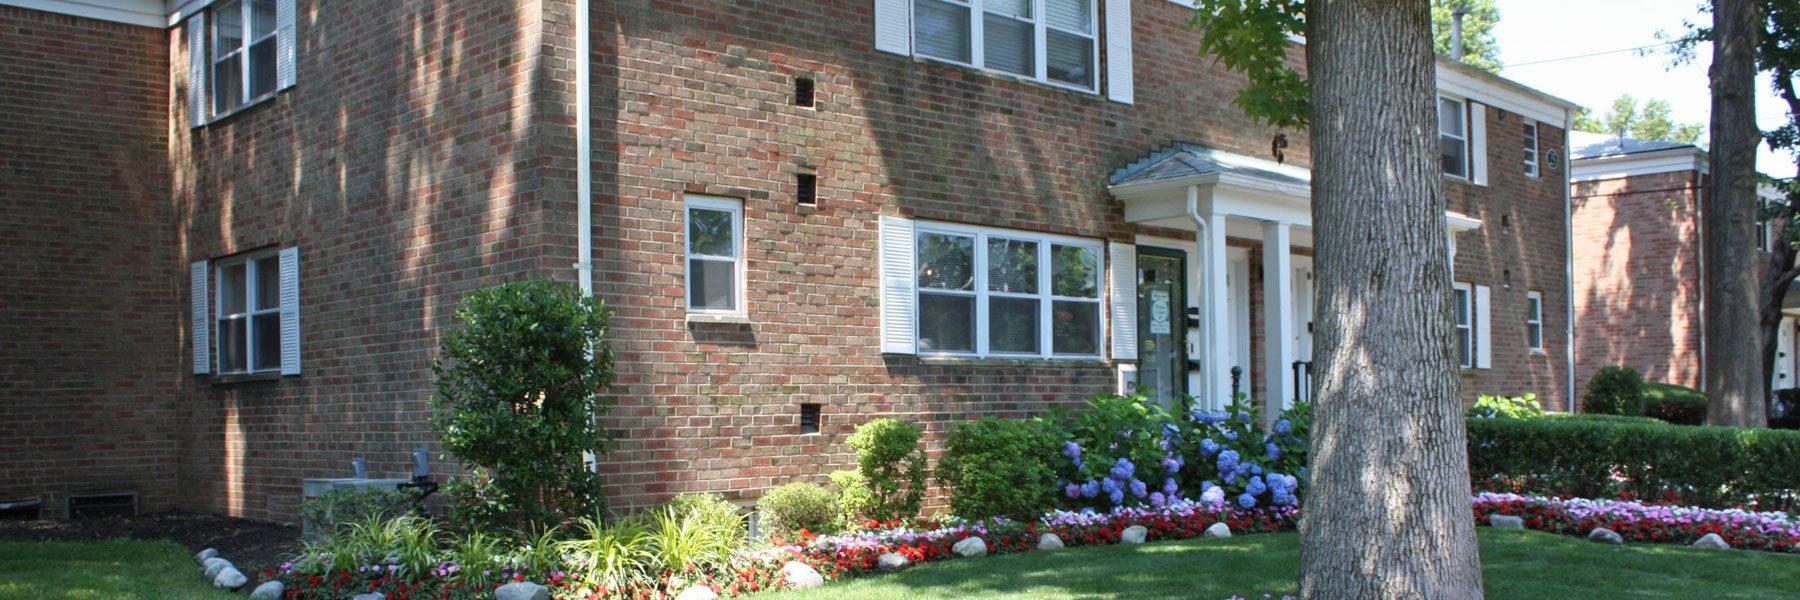 Carlton Club Apartments For Rent in Piscataway, NJ